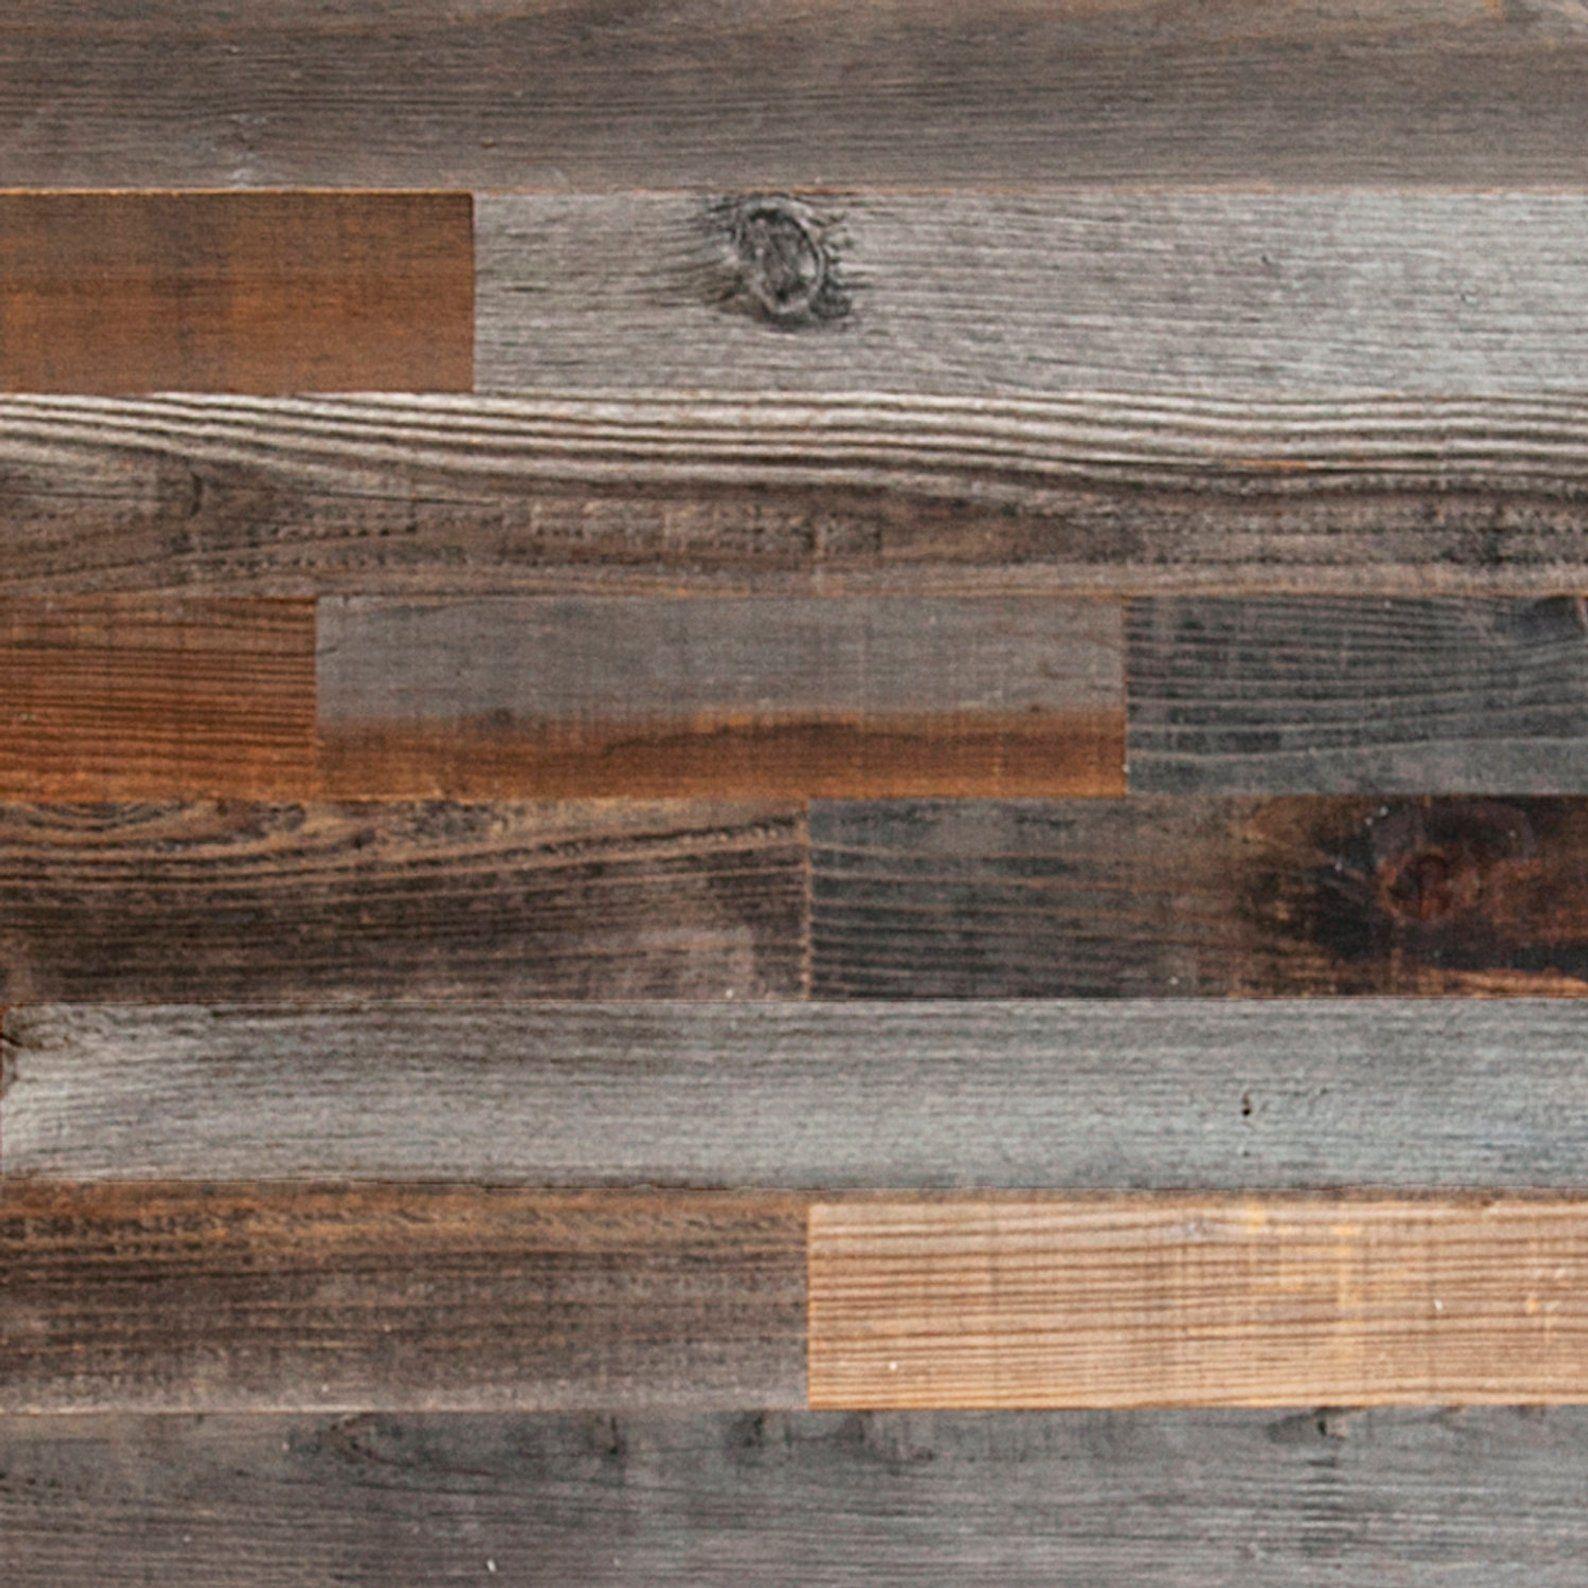 Reclaimed Barn Wood 3 Wide Planks 40